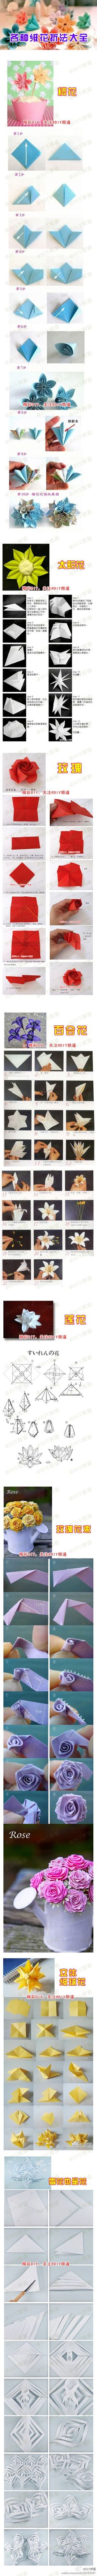 Origami flowers Origami flowers Origami flowers